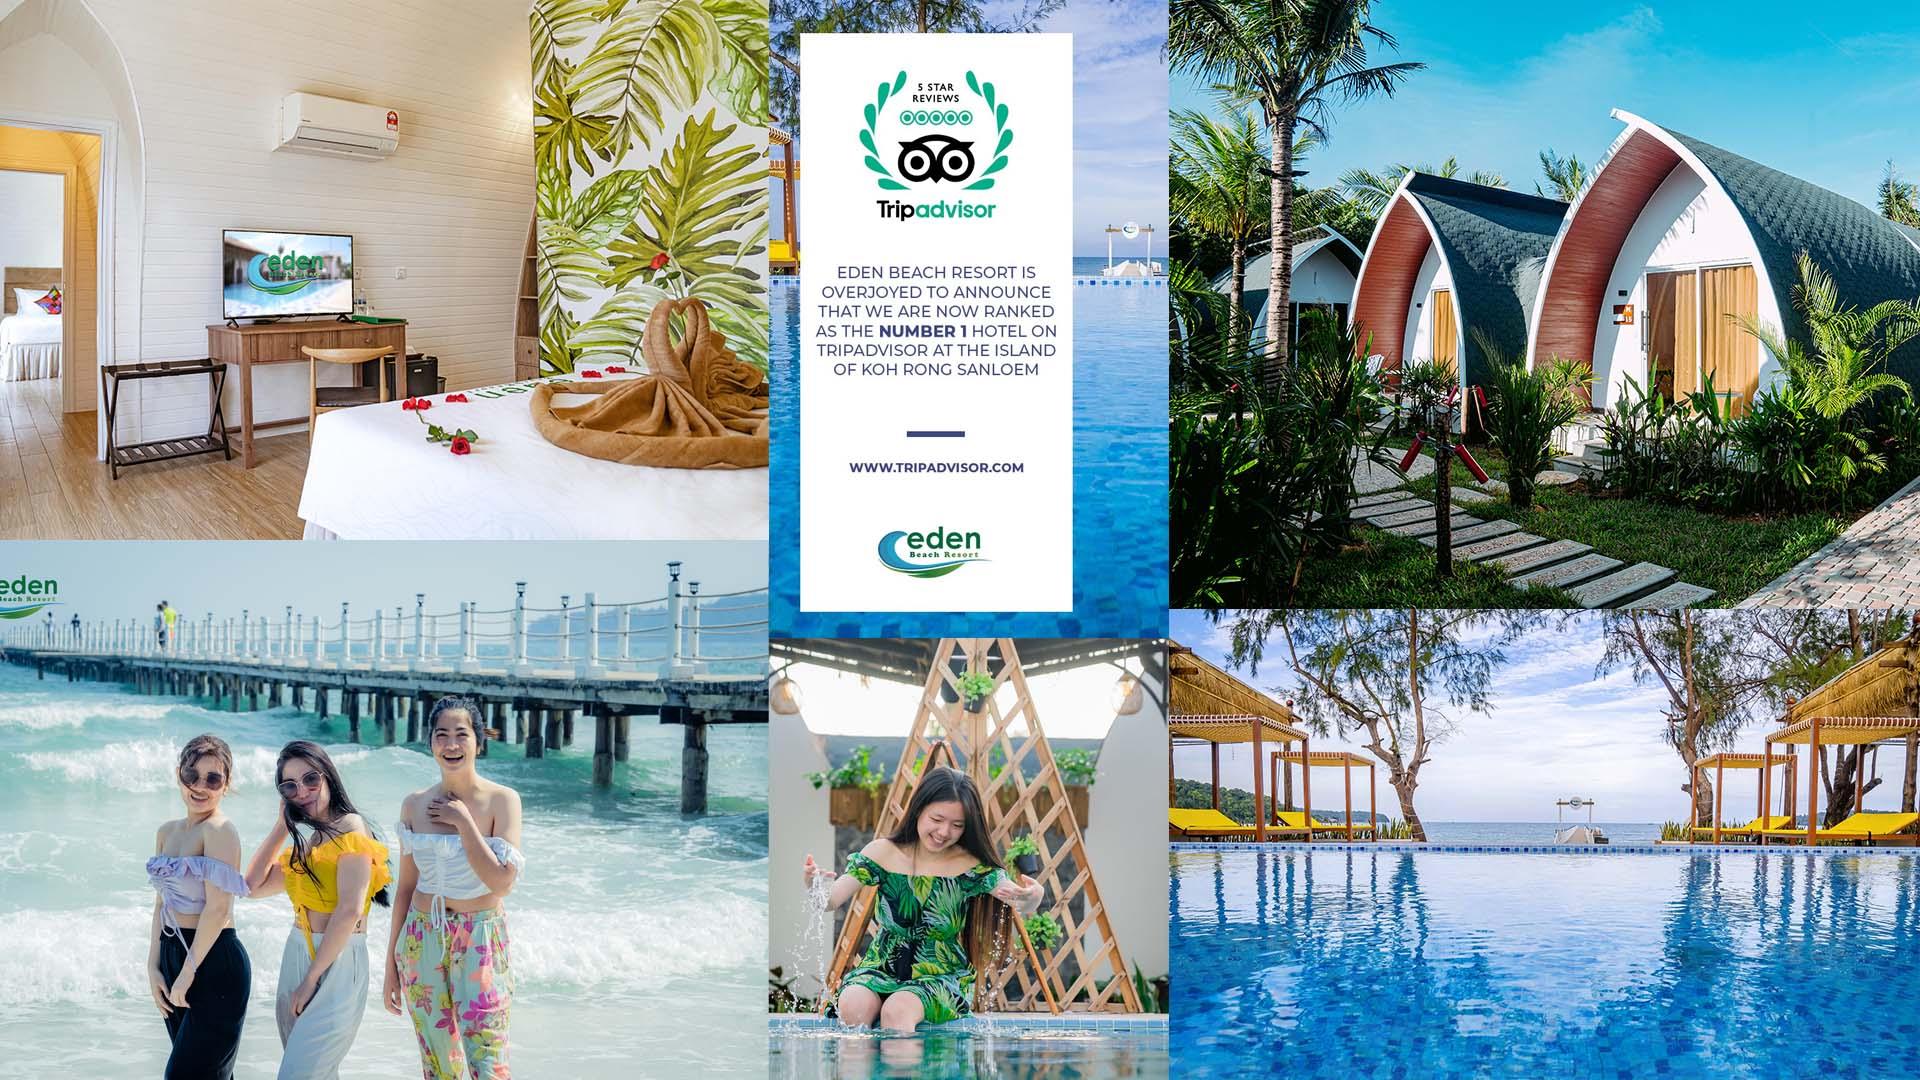 Eden Beach Resort នៅកោះរ៉ុងសន្លឹម ជាប់ចំណាត់ថ្នាក់លេខ១ ពីគេហទំព័រល្បីឈ្មោះ TripAdvisor